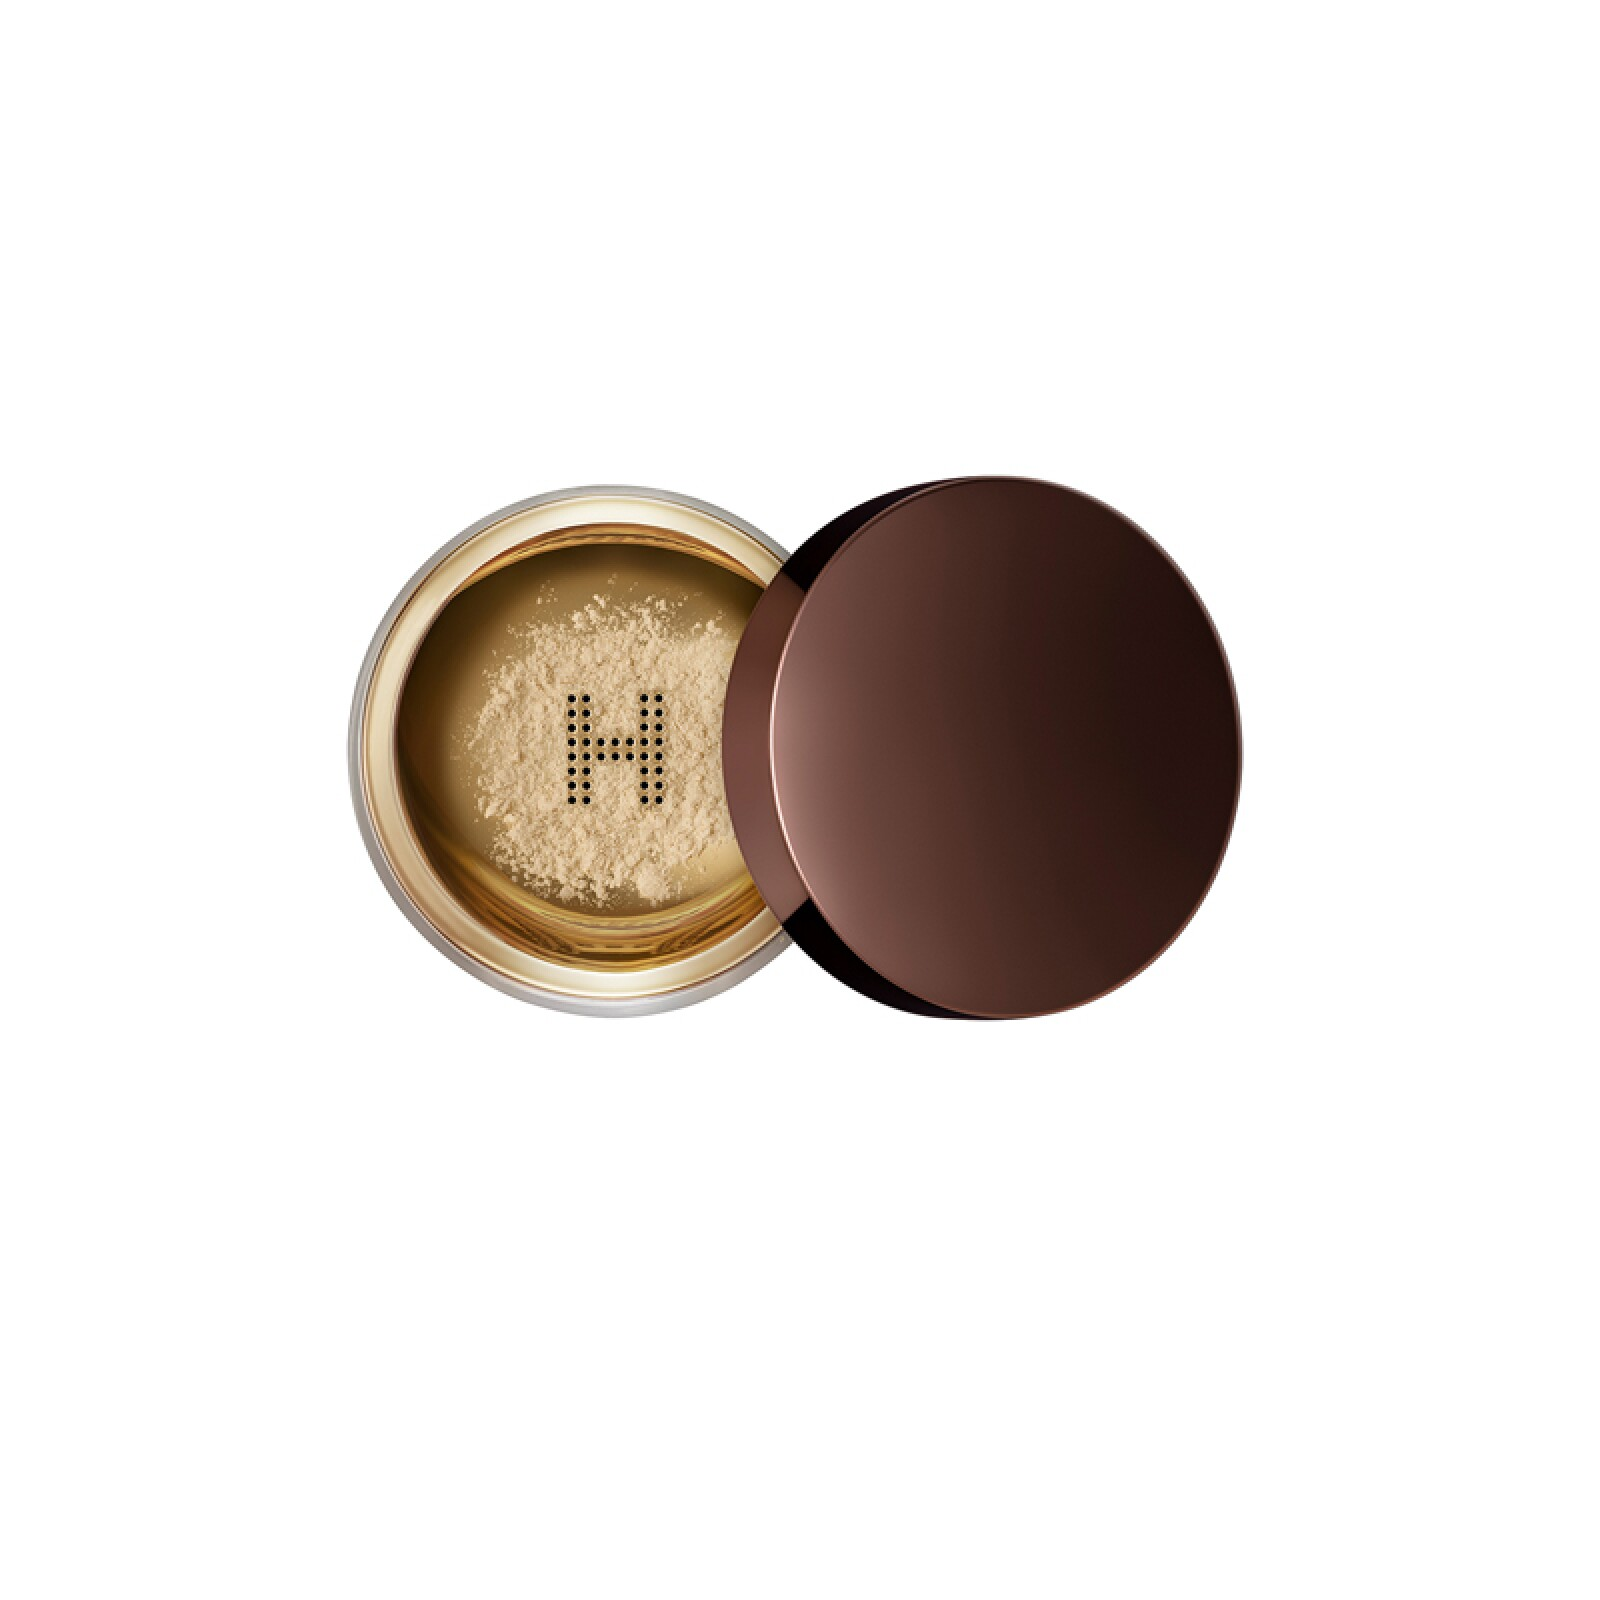 polvos-selladores-maquillaje-setting powder-baking-makeup-hourglass